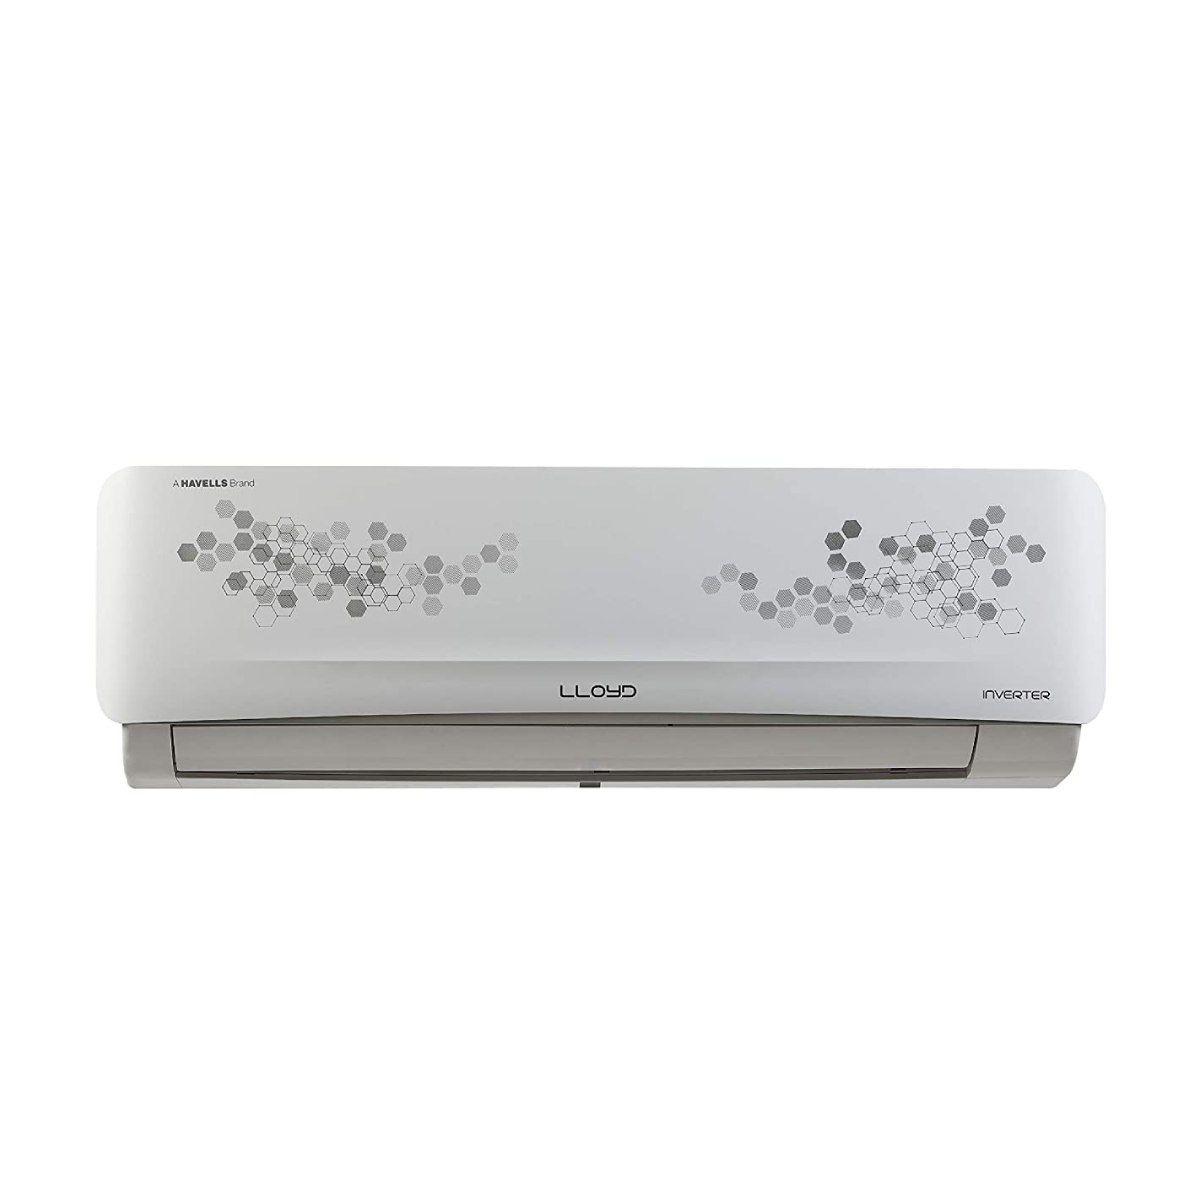 लोईड 1.0 Ton 3 Star Inverter Split AC (2021,GLS12I36WRBP)